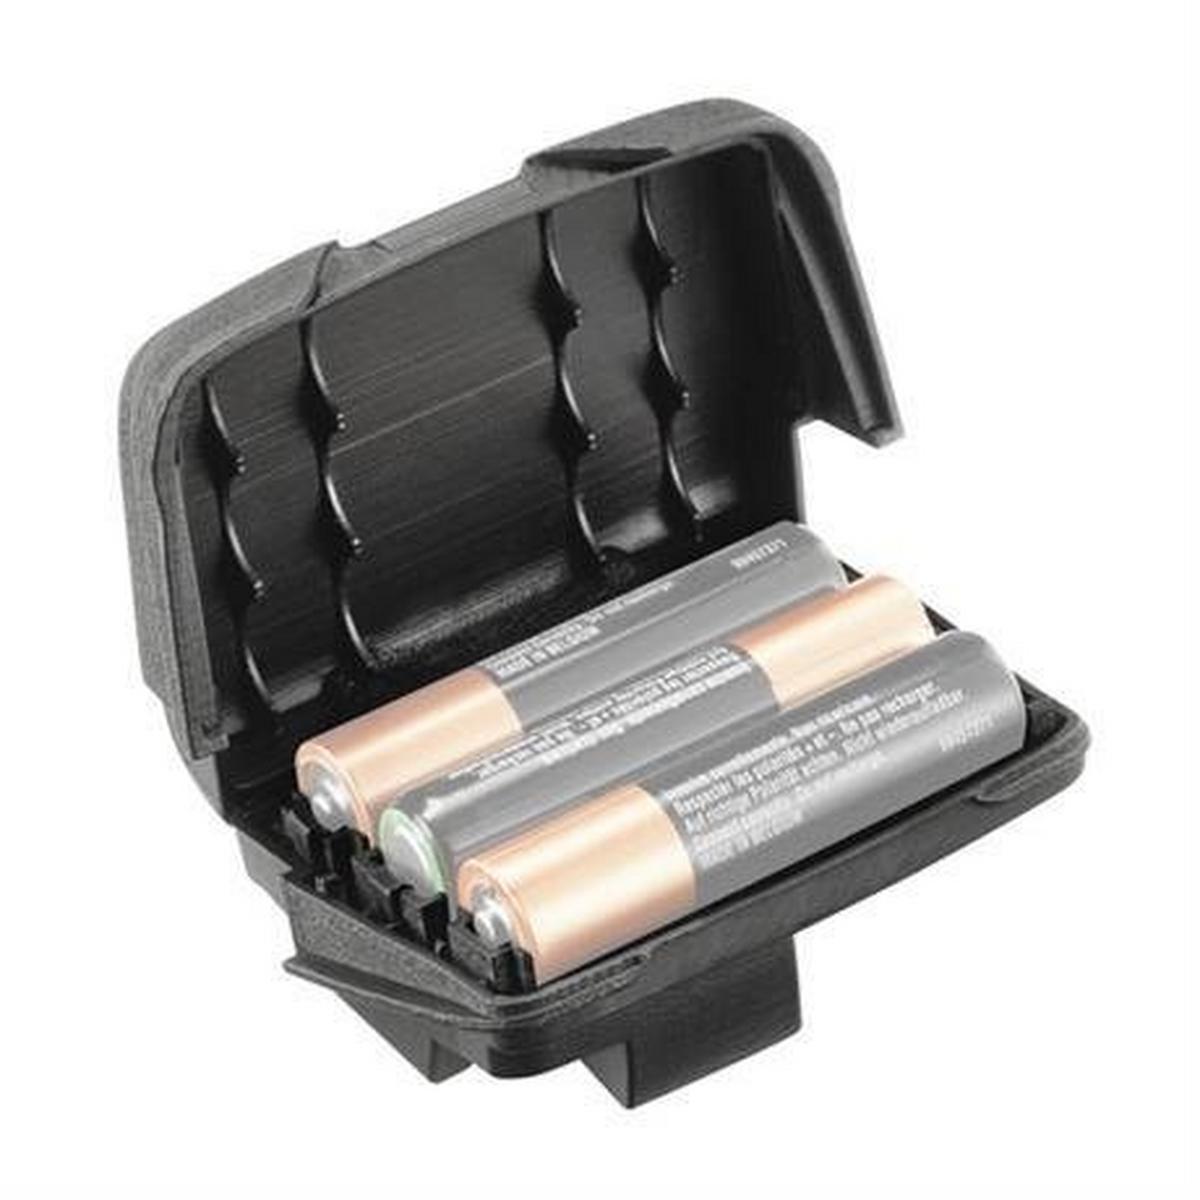 Petzl Charlet Petzl Spare/Accessory Battery Pack for Reactik, Reactik+ Headtorches